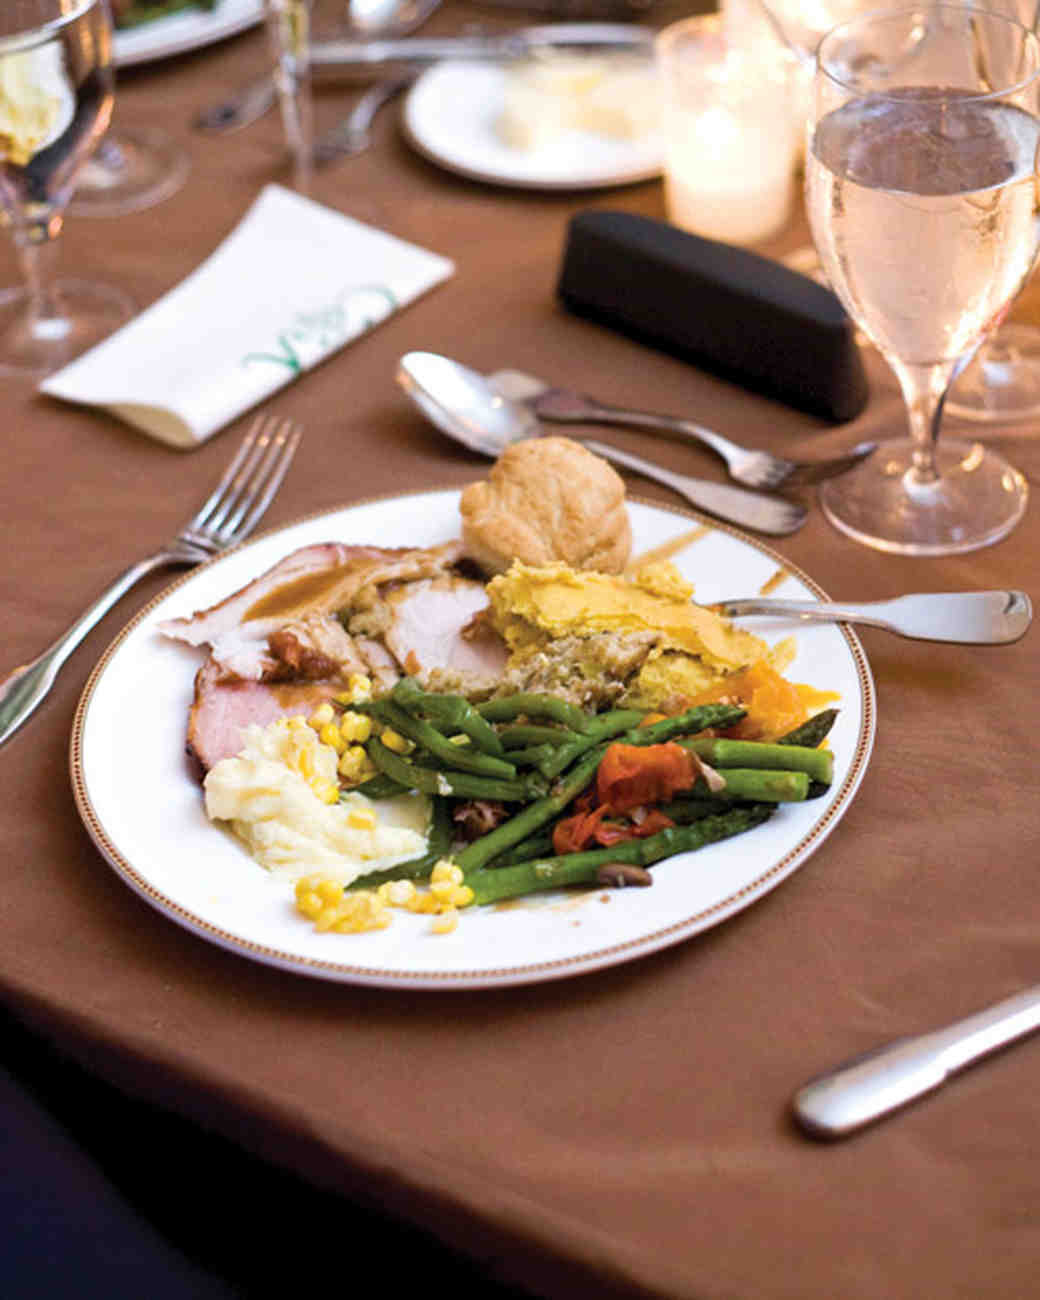 Wedding Dinner Ideas  Cheap wedding ideas All about party for wedding Best